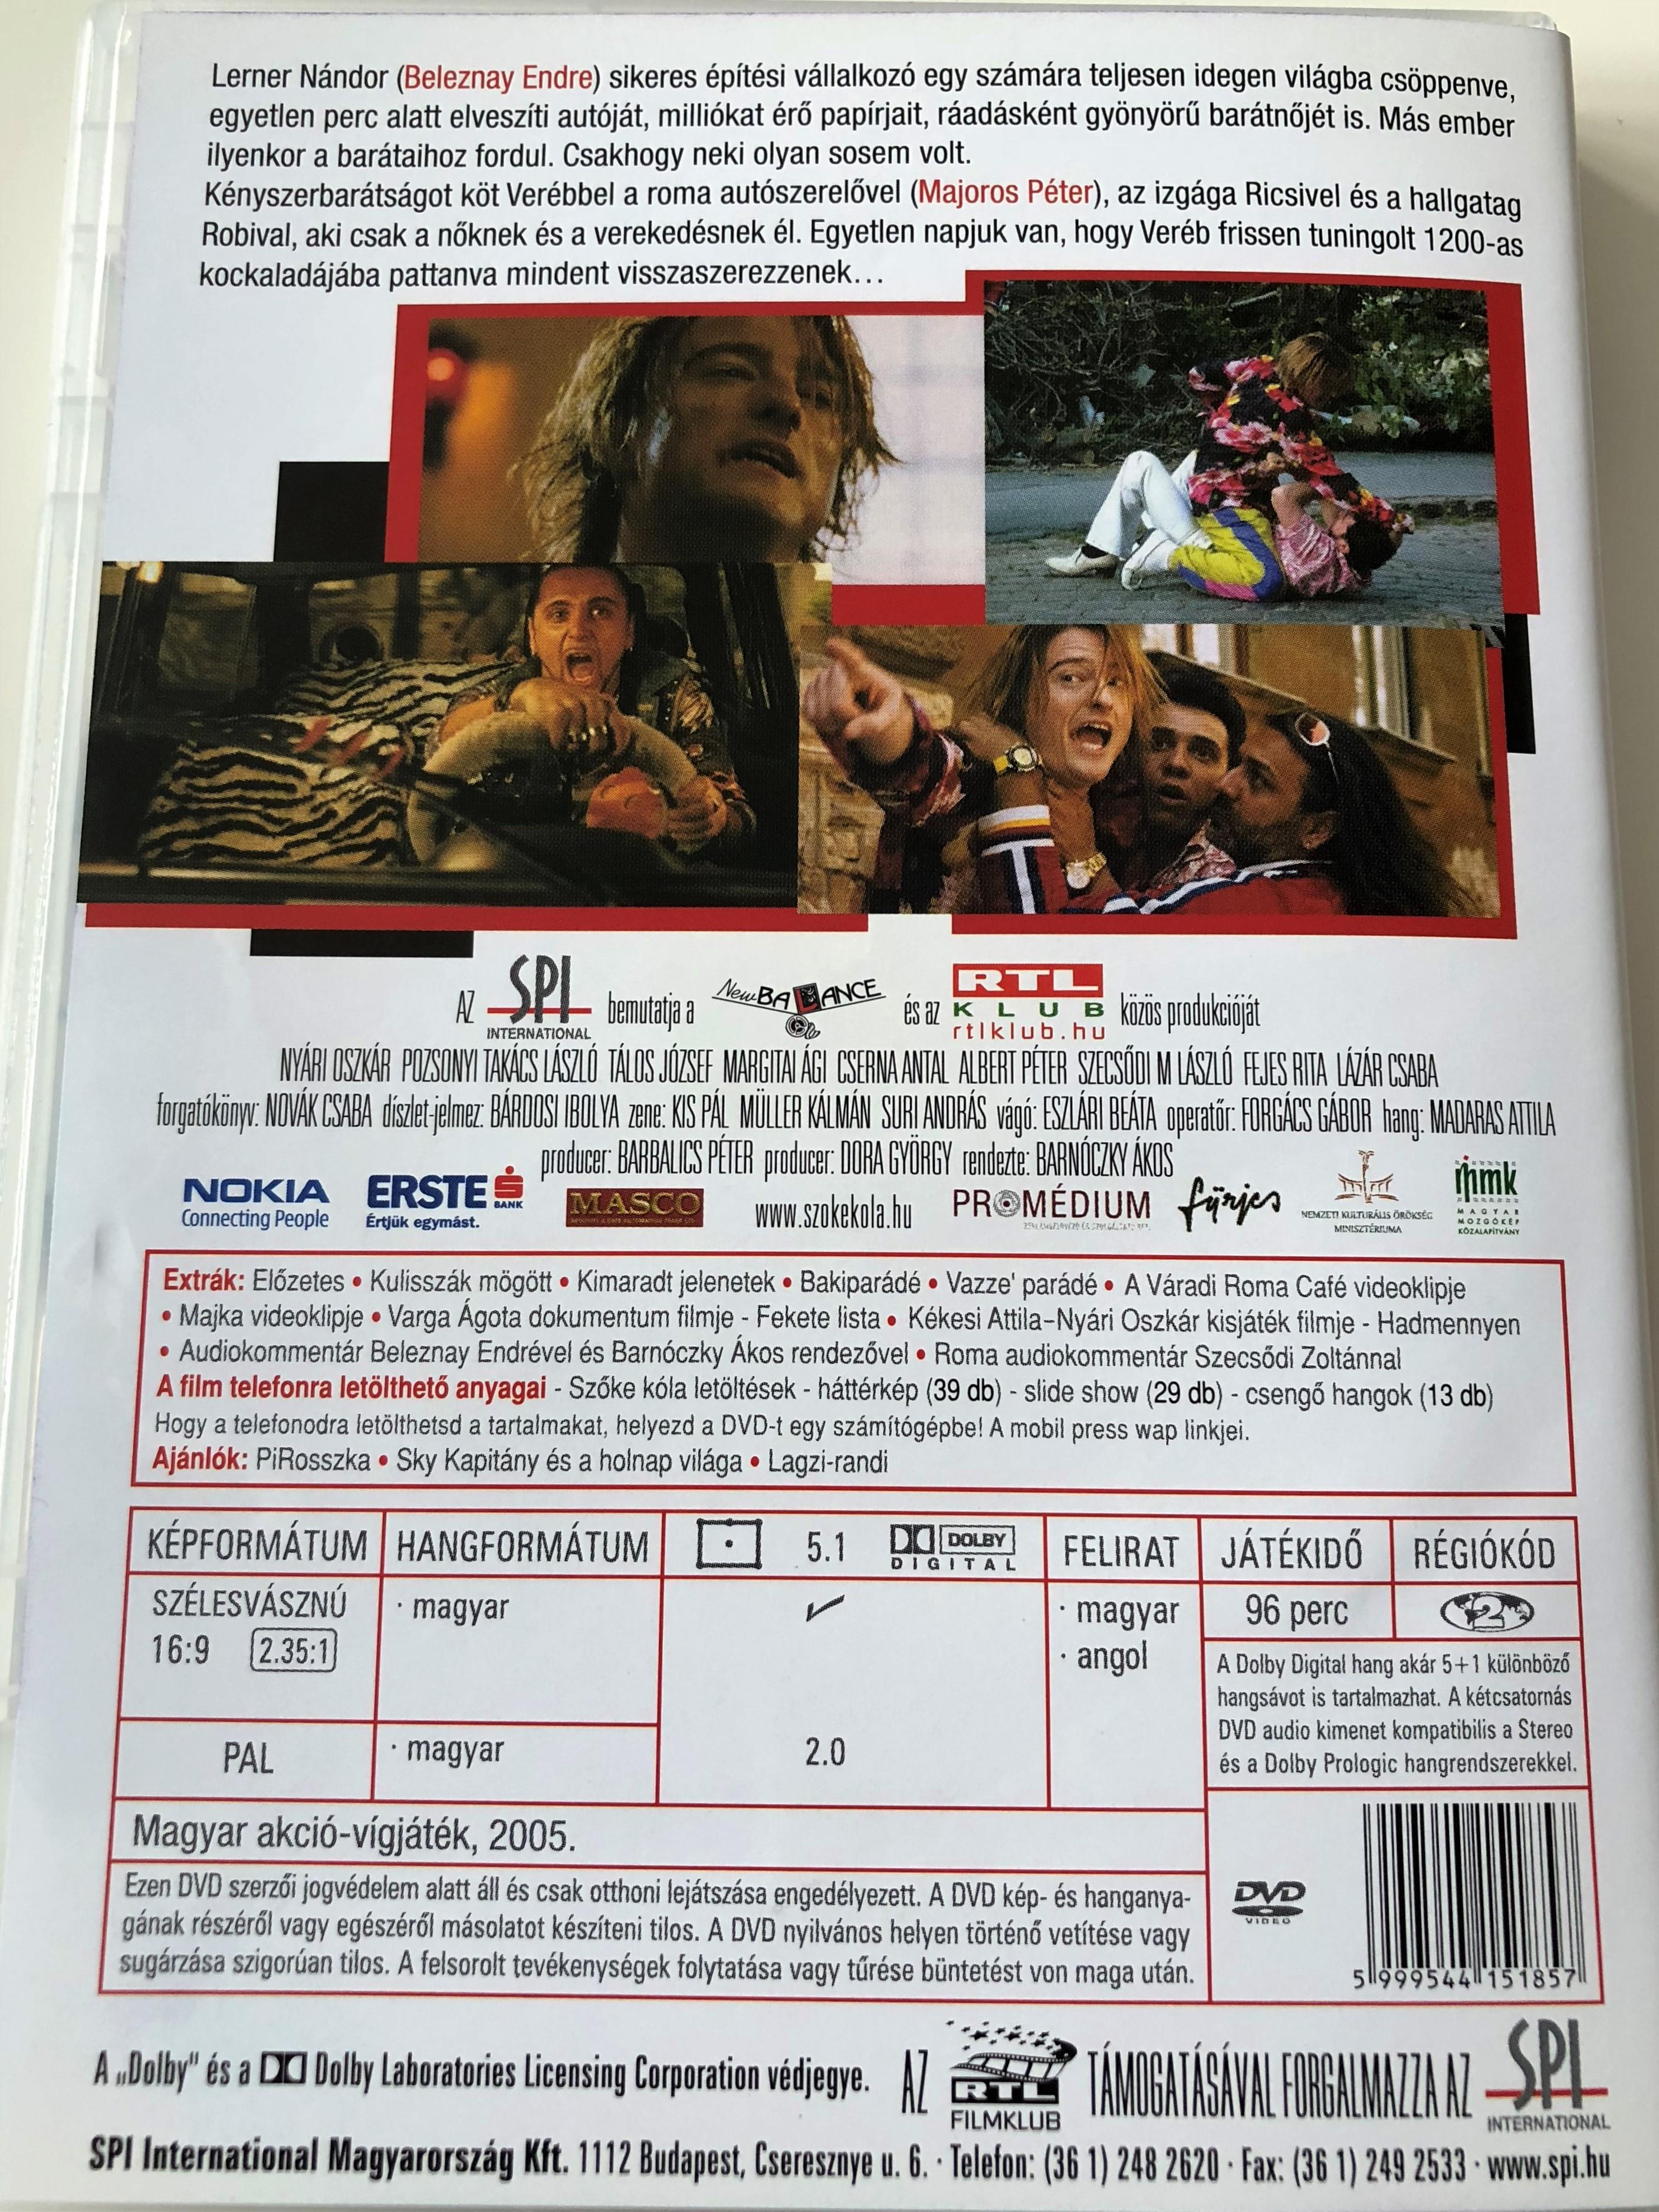 sz-ke-k-la-dvd-2005-blonde-cola-directed-by-barn-czky-kos-starring-g-r-g-zita-beleznay-endre-majka-gub-s-gabi-2-.jpg